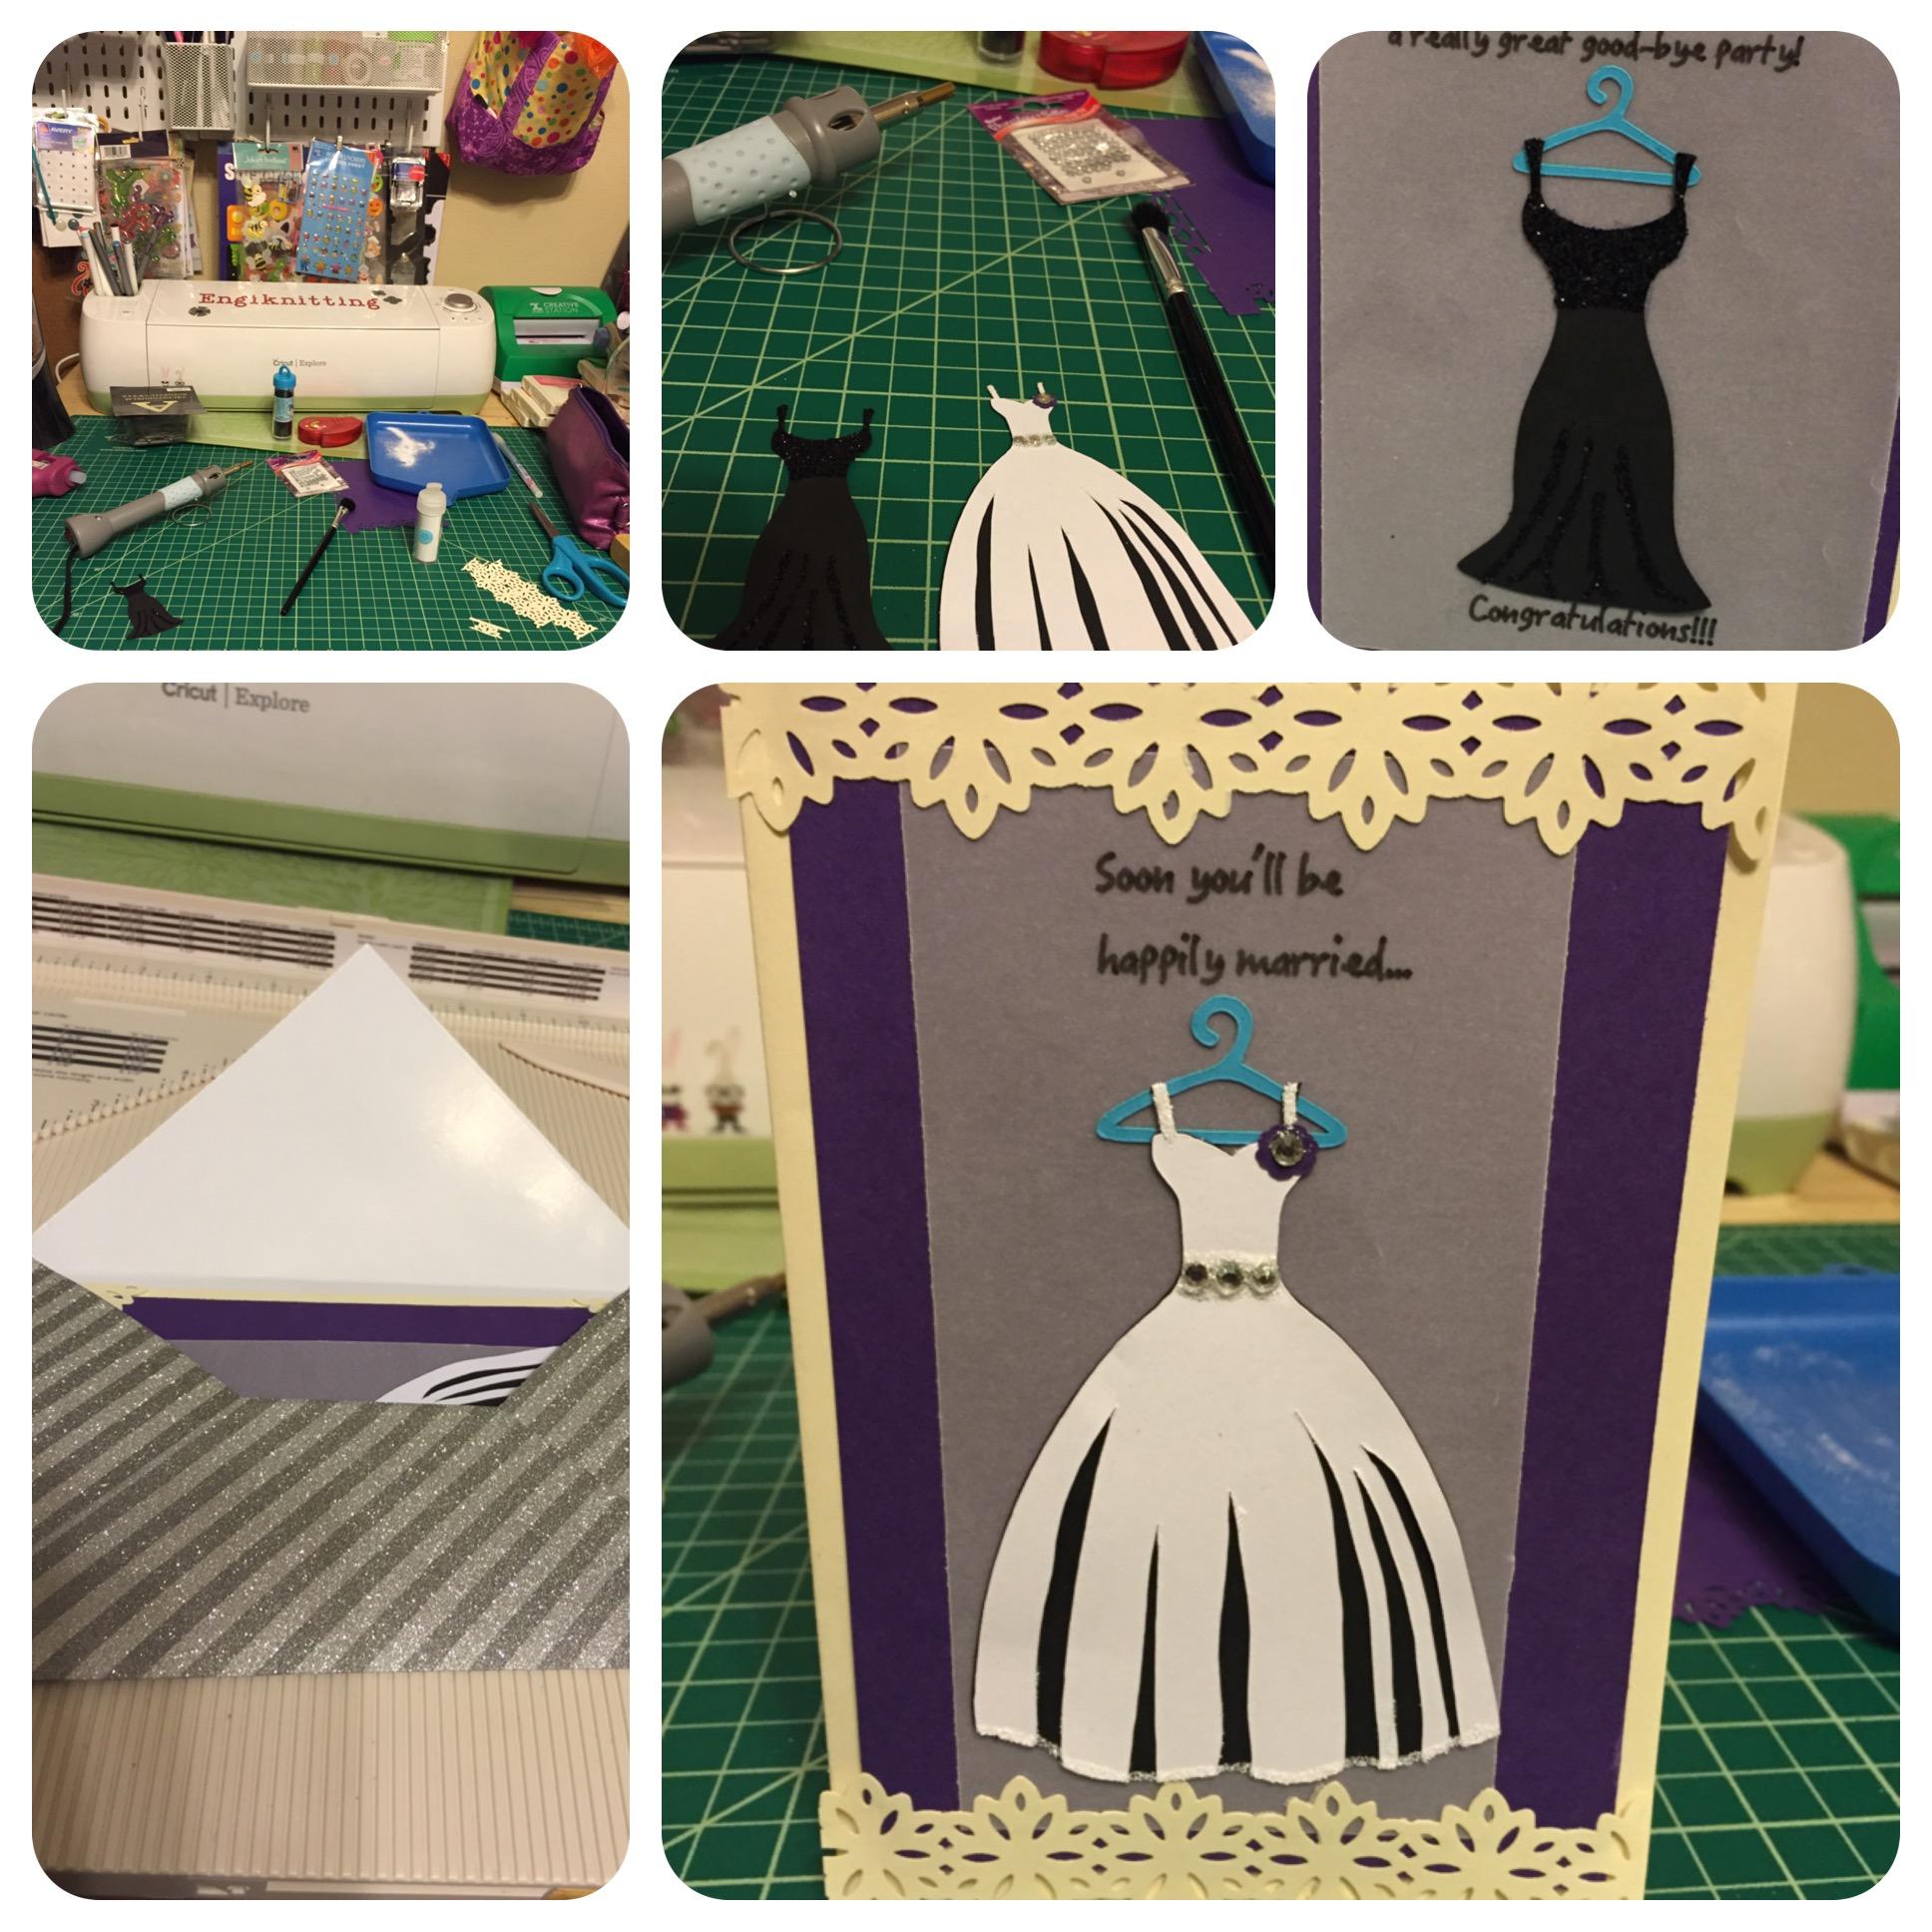 A Bridal Shower card.